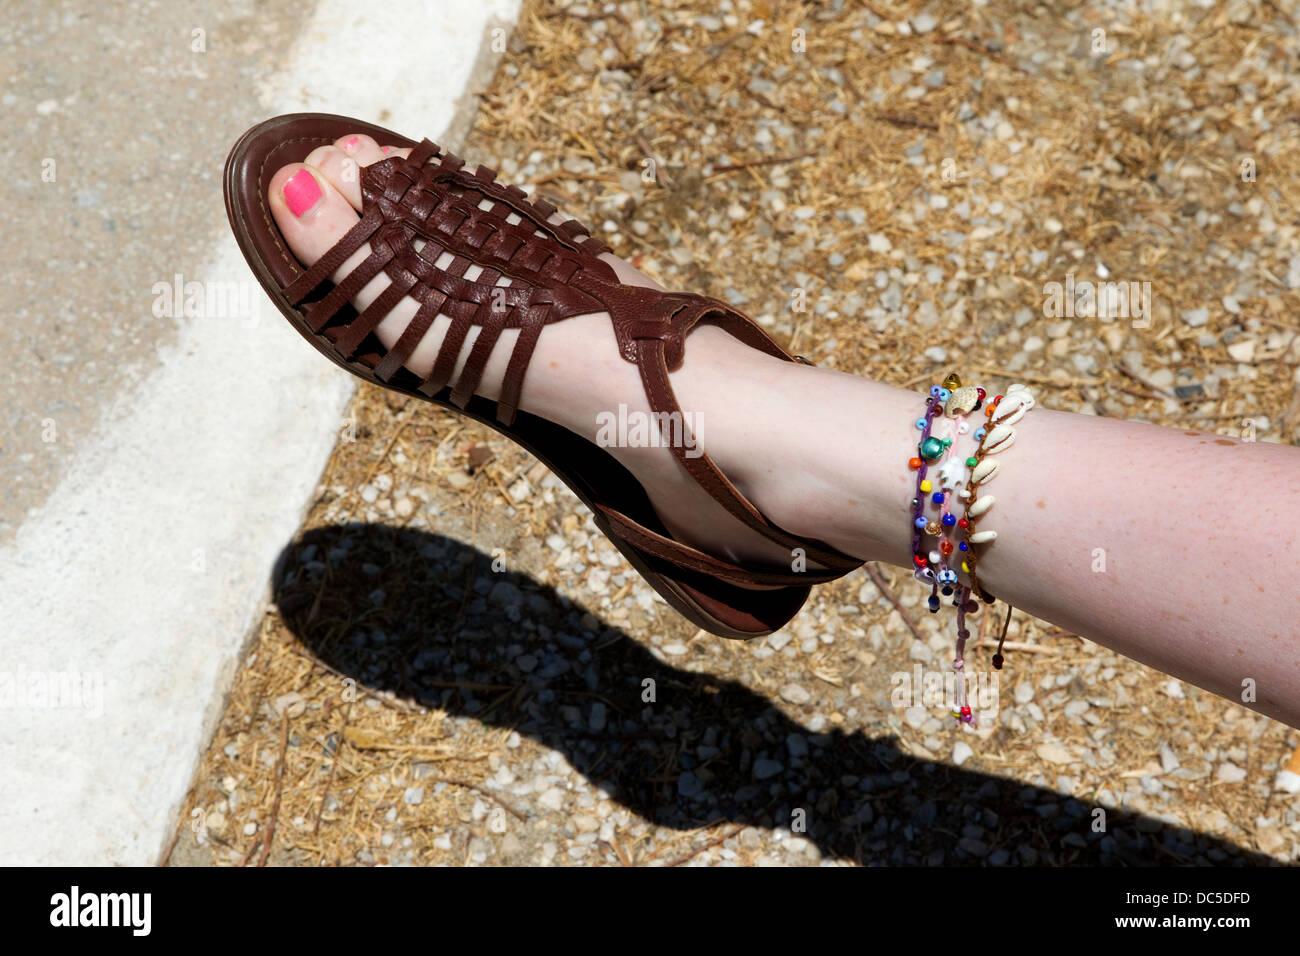 Girls sandal with ankle bracelets - Stock Image